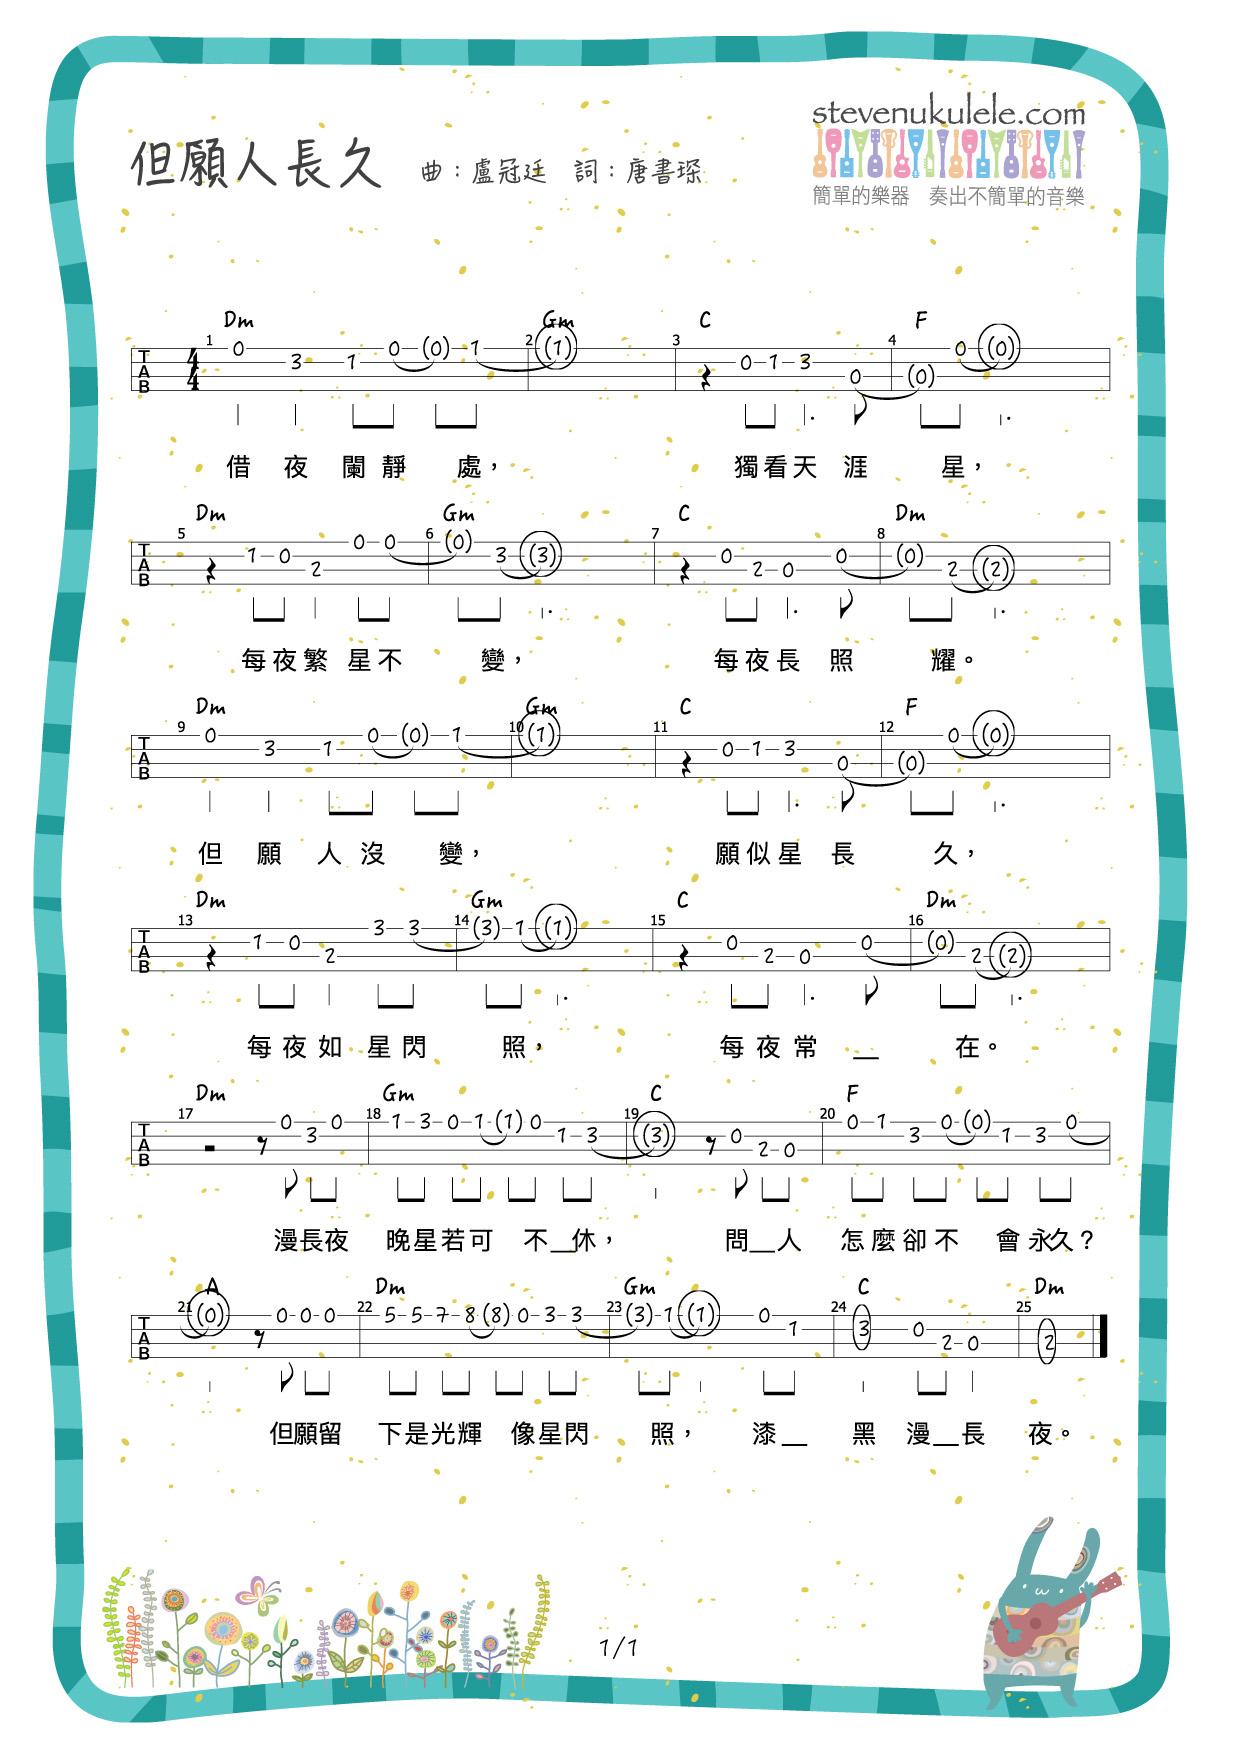 但願人長久・盧冠延   steven.ukulele